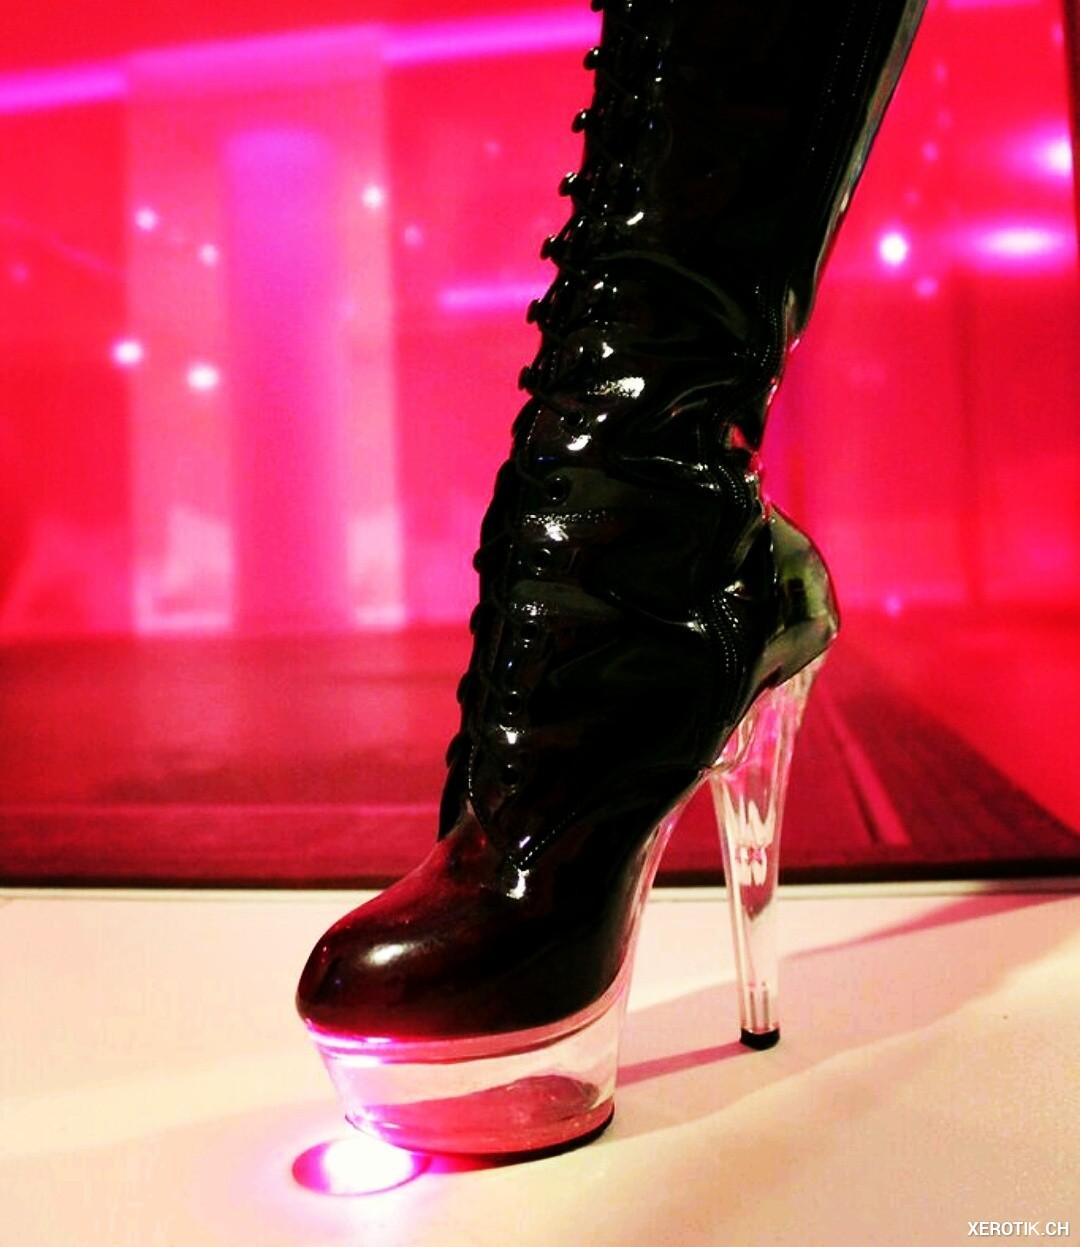 Erotik inserate Berührbare Dominanz Lady Jana zu Gast in Zürich Centrum